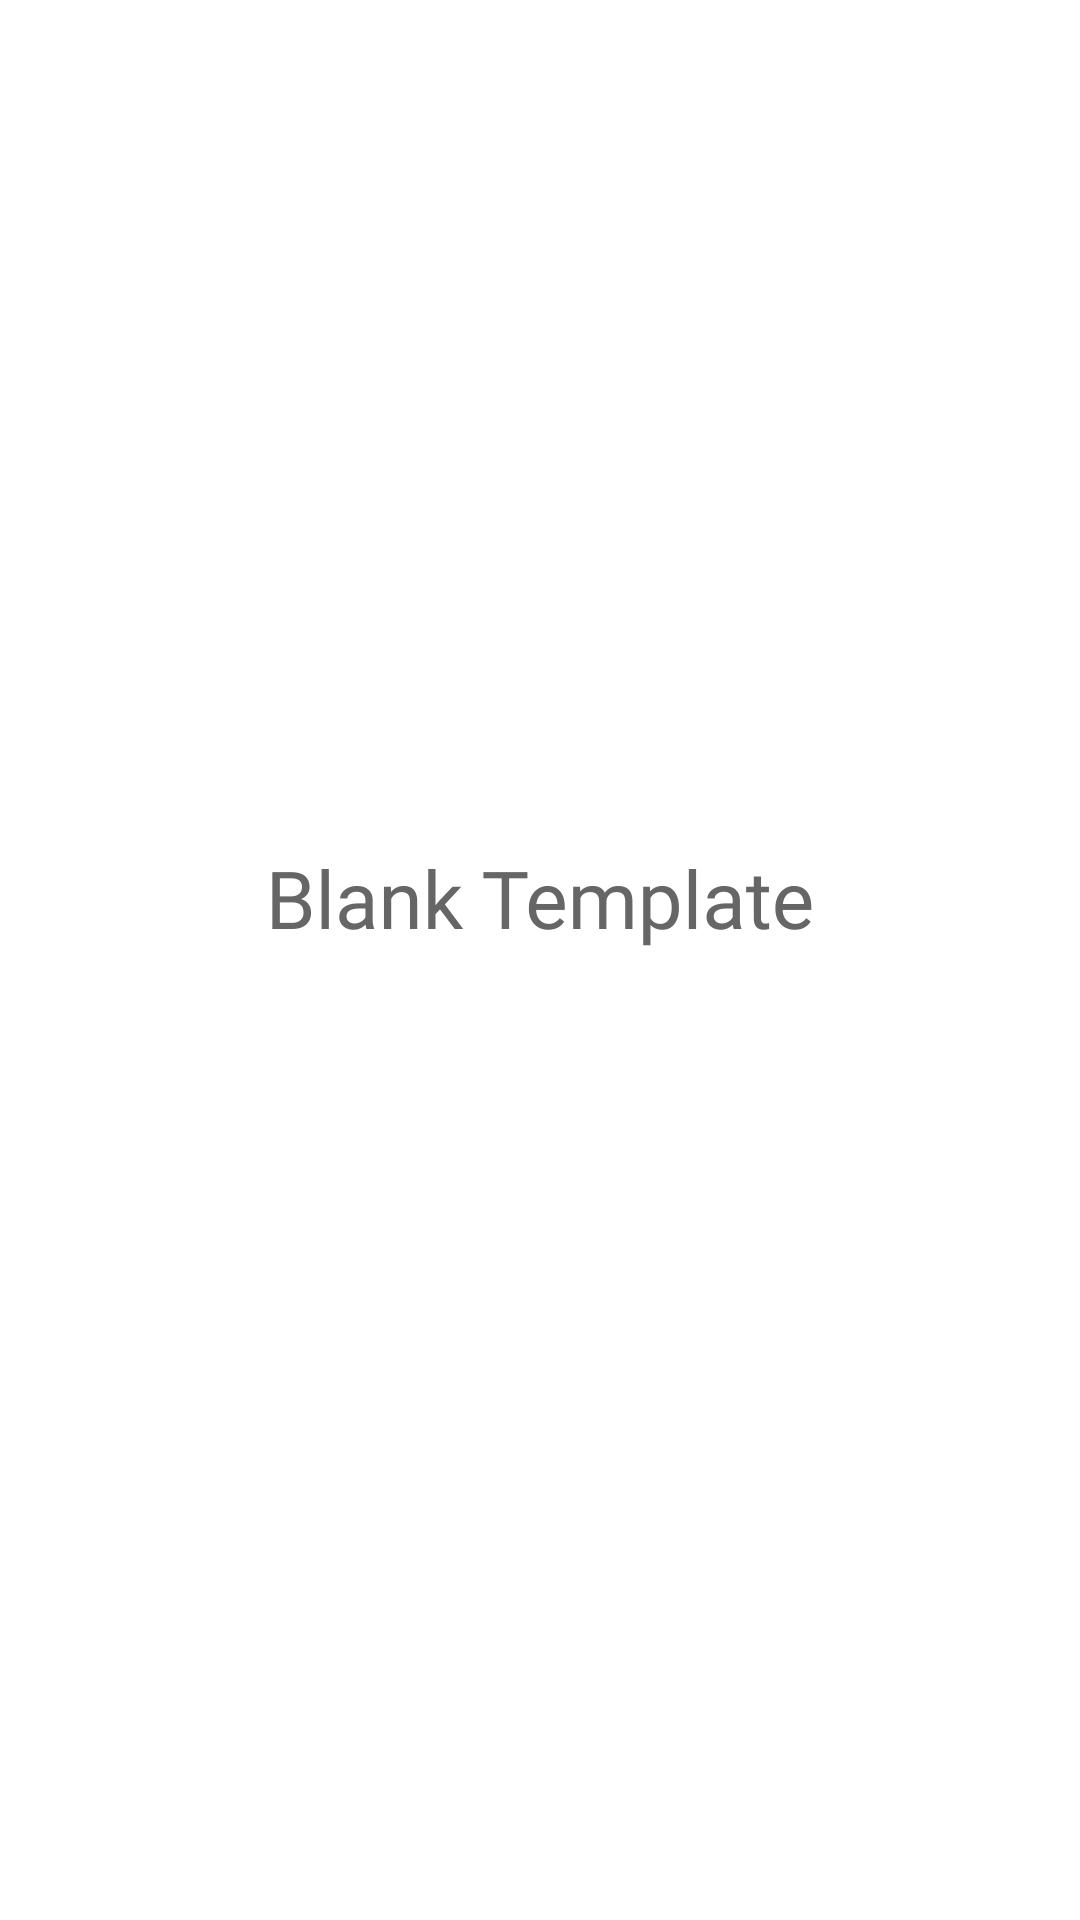 Blank Template Instagram Stories Template